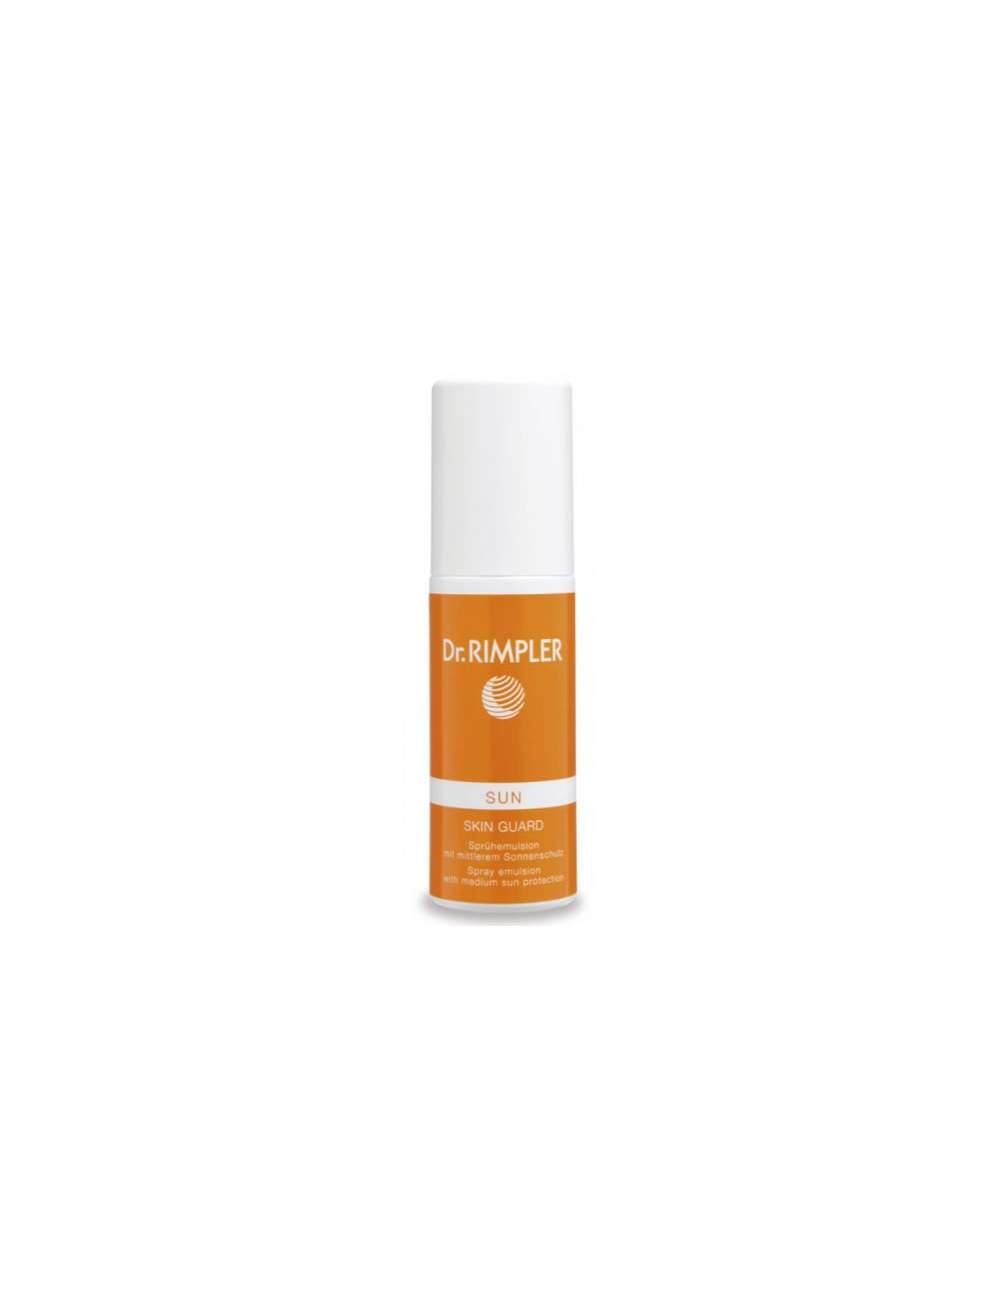 Spray Protección Solar Corporal SPF 15 Skin Guard. Dr. Rimpler.